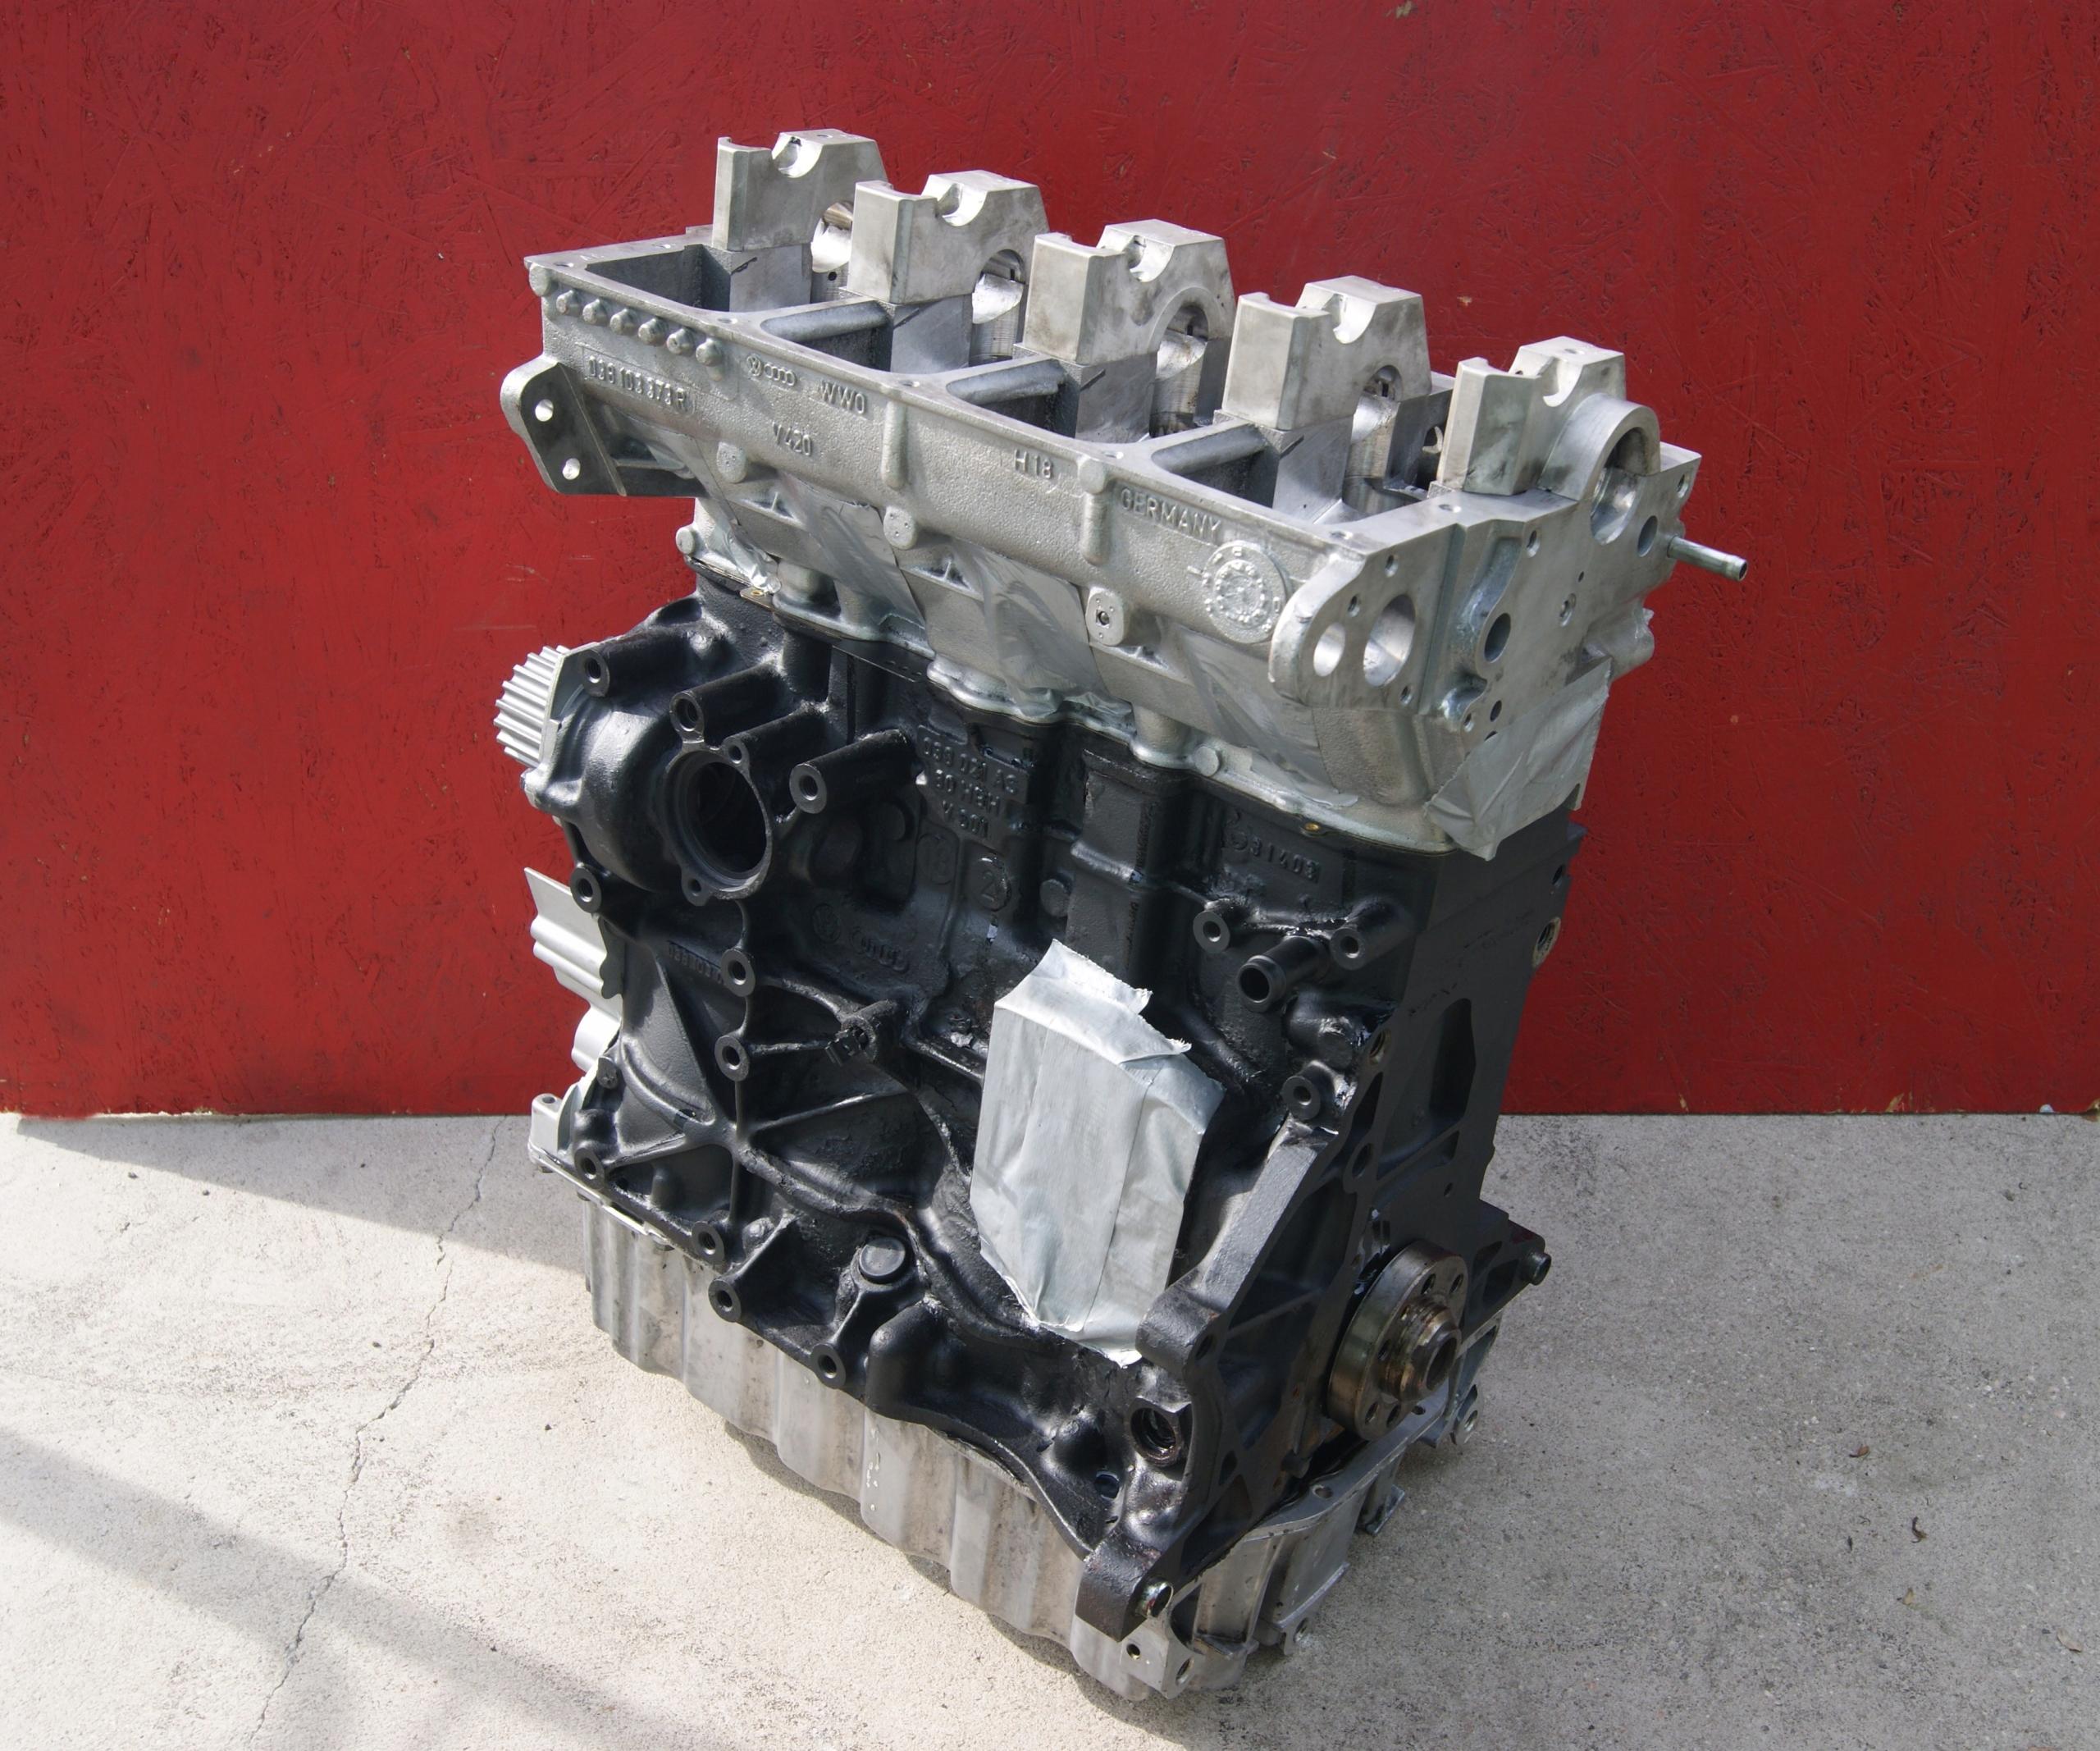 двигатель 19 tdi 20tdi 8v замена bls bxe бгу brt